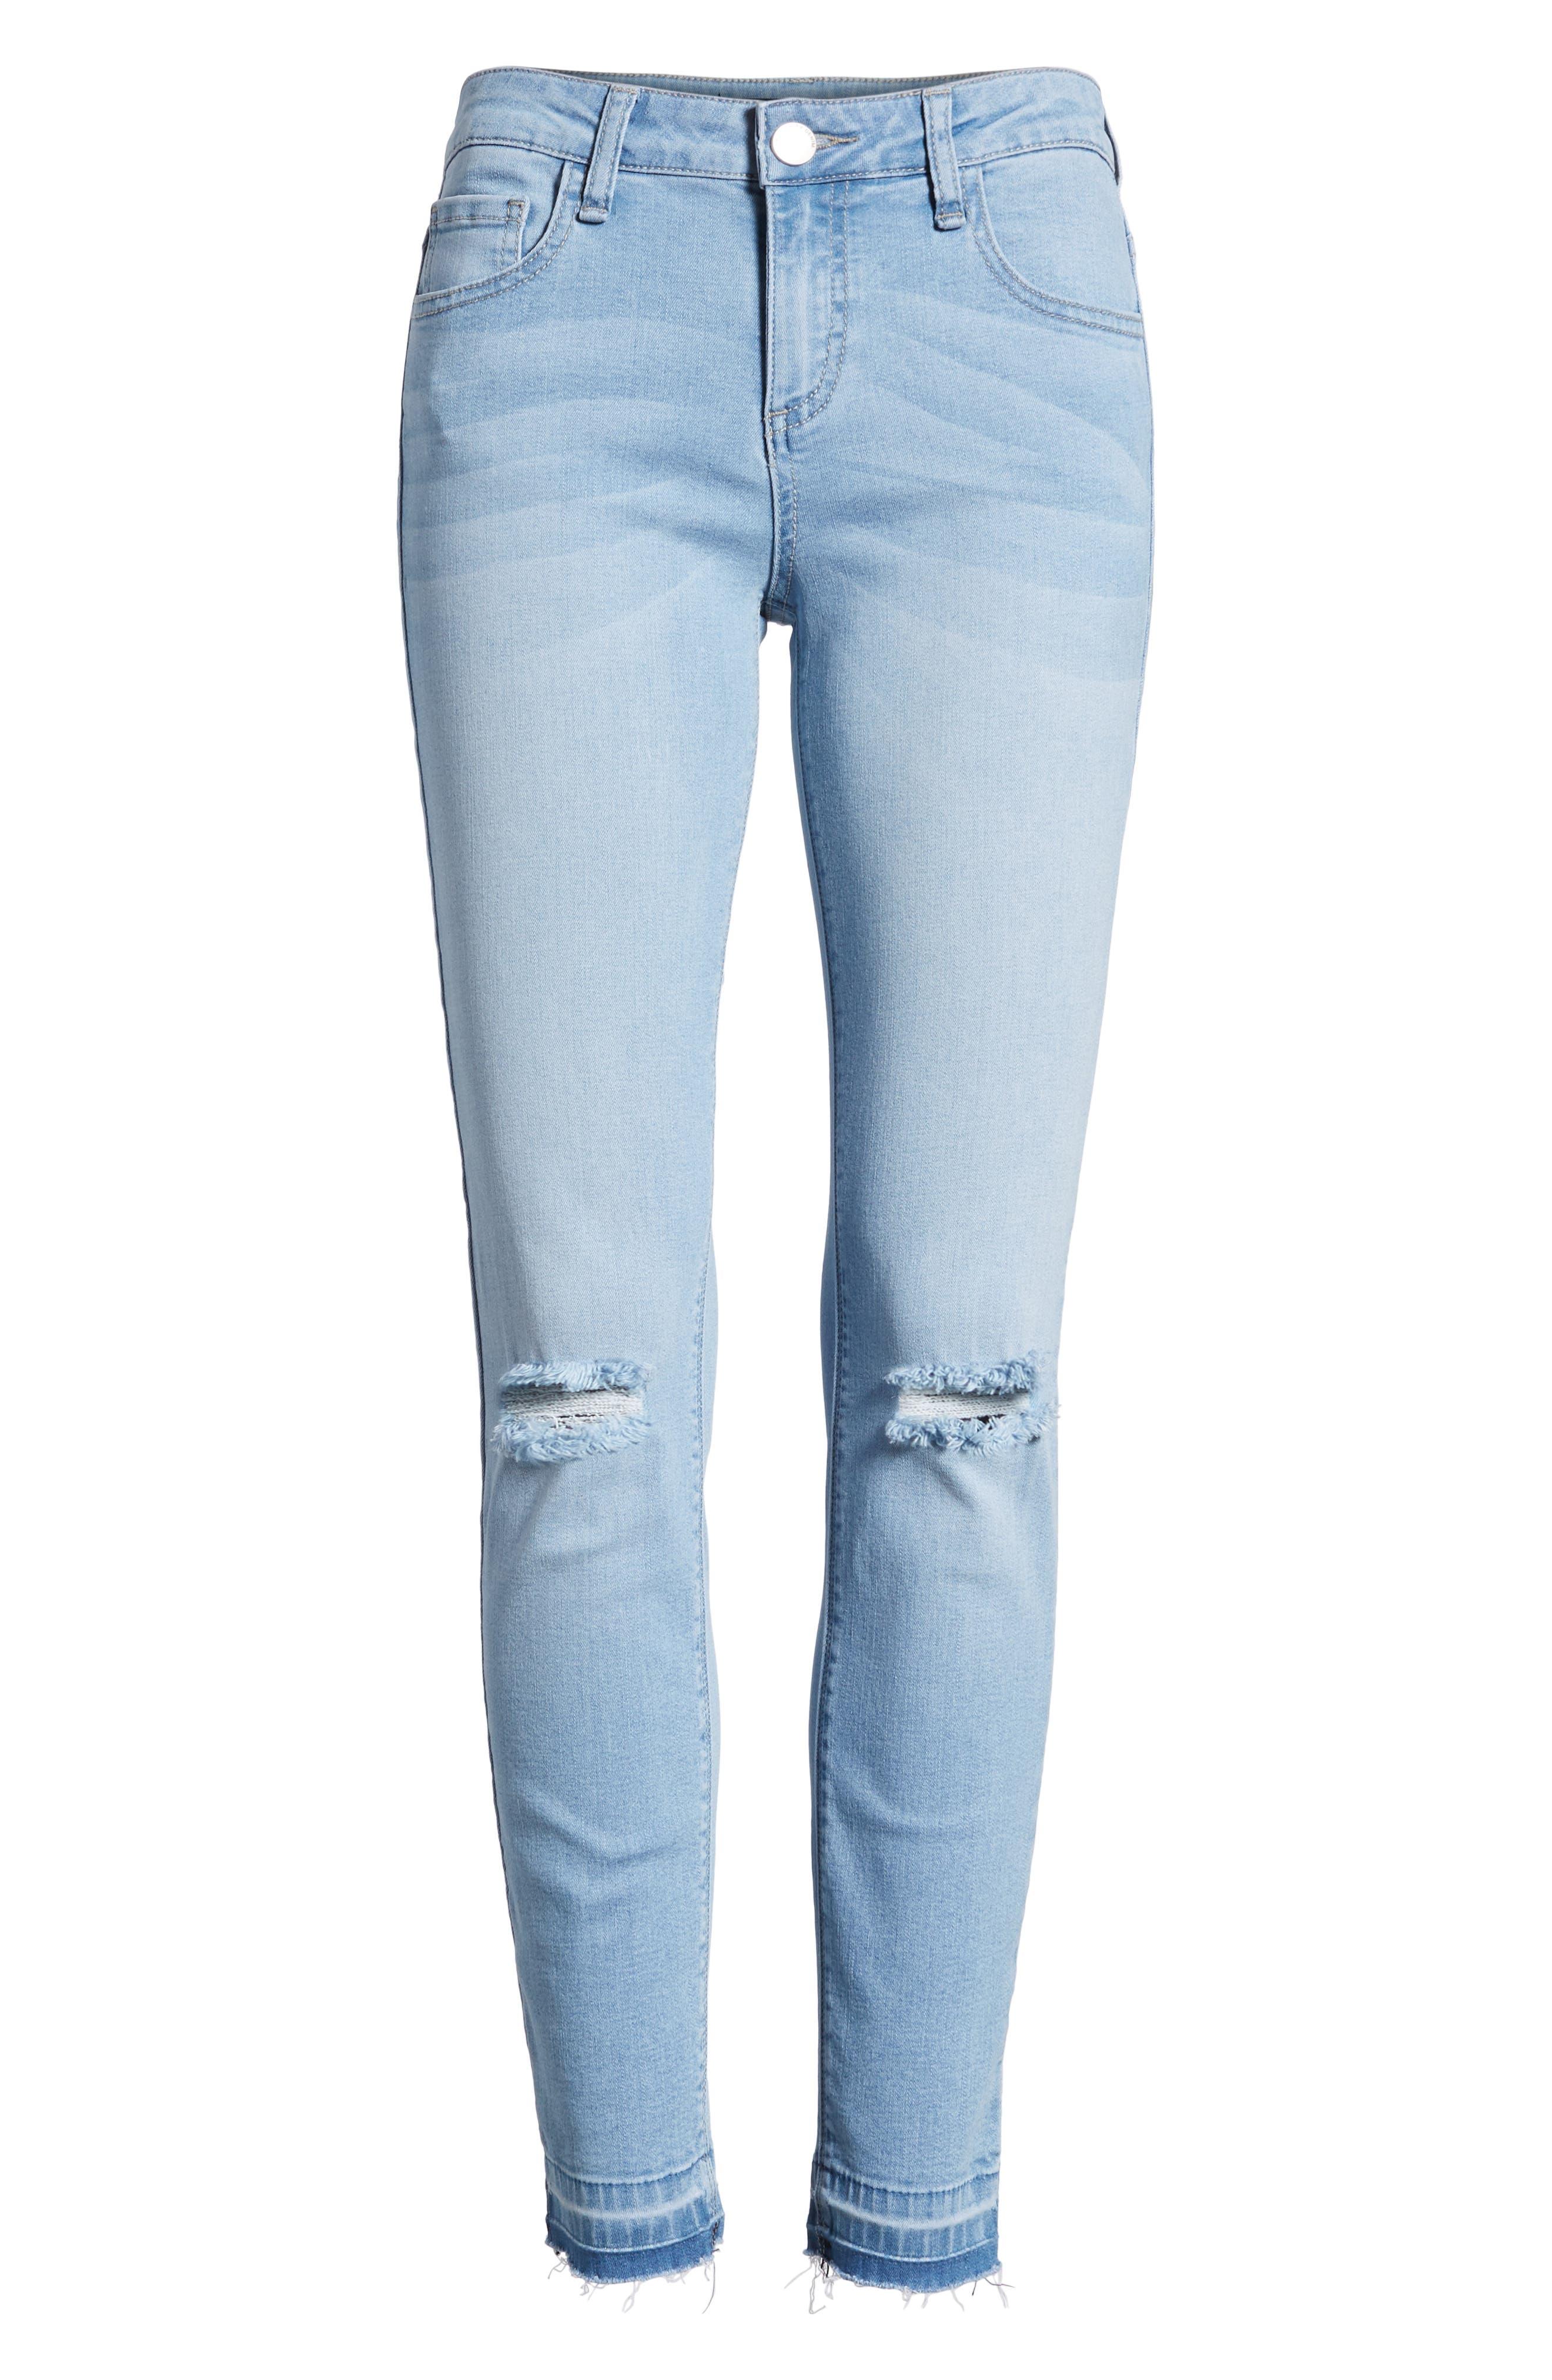 Release Hem Skinny Jeans,                             Alternate thumbnail 7, color,                             Ashley